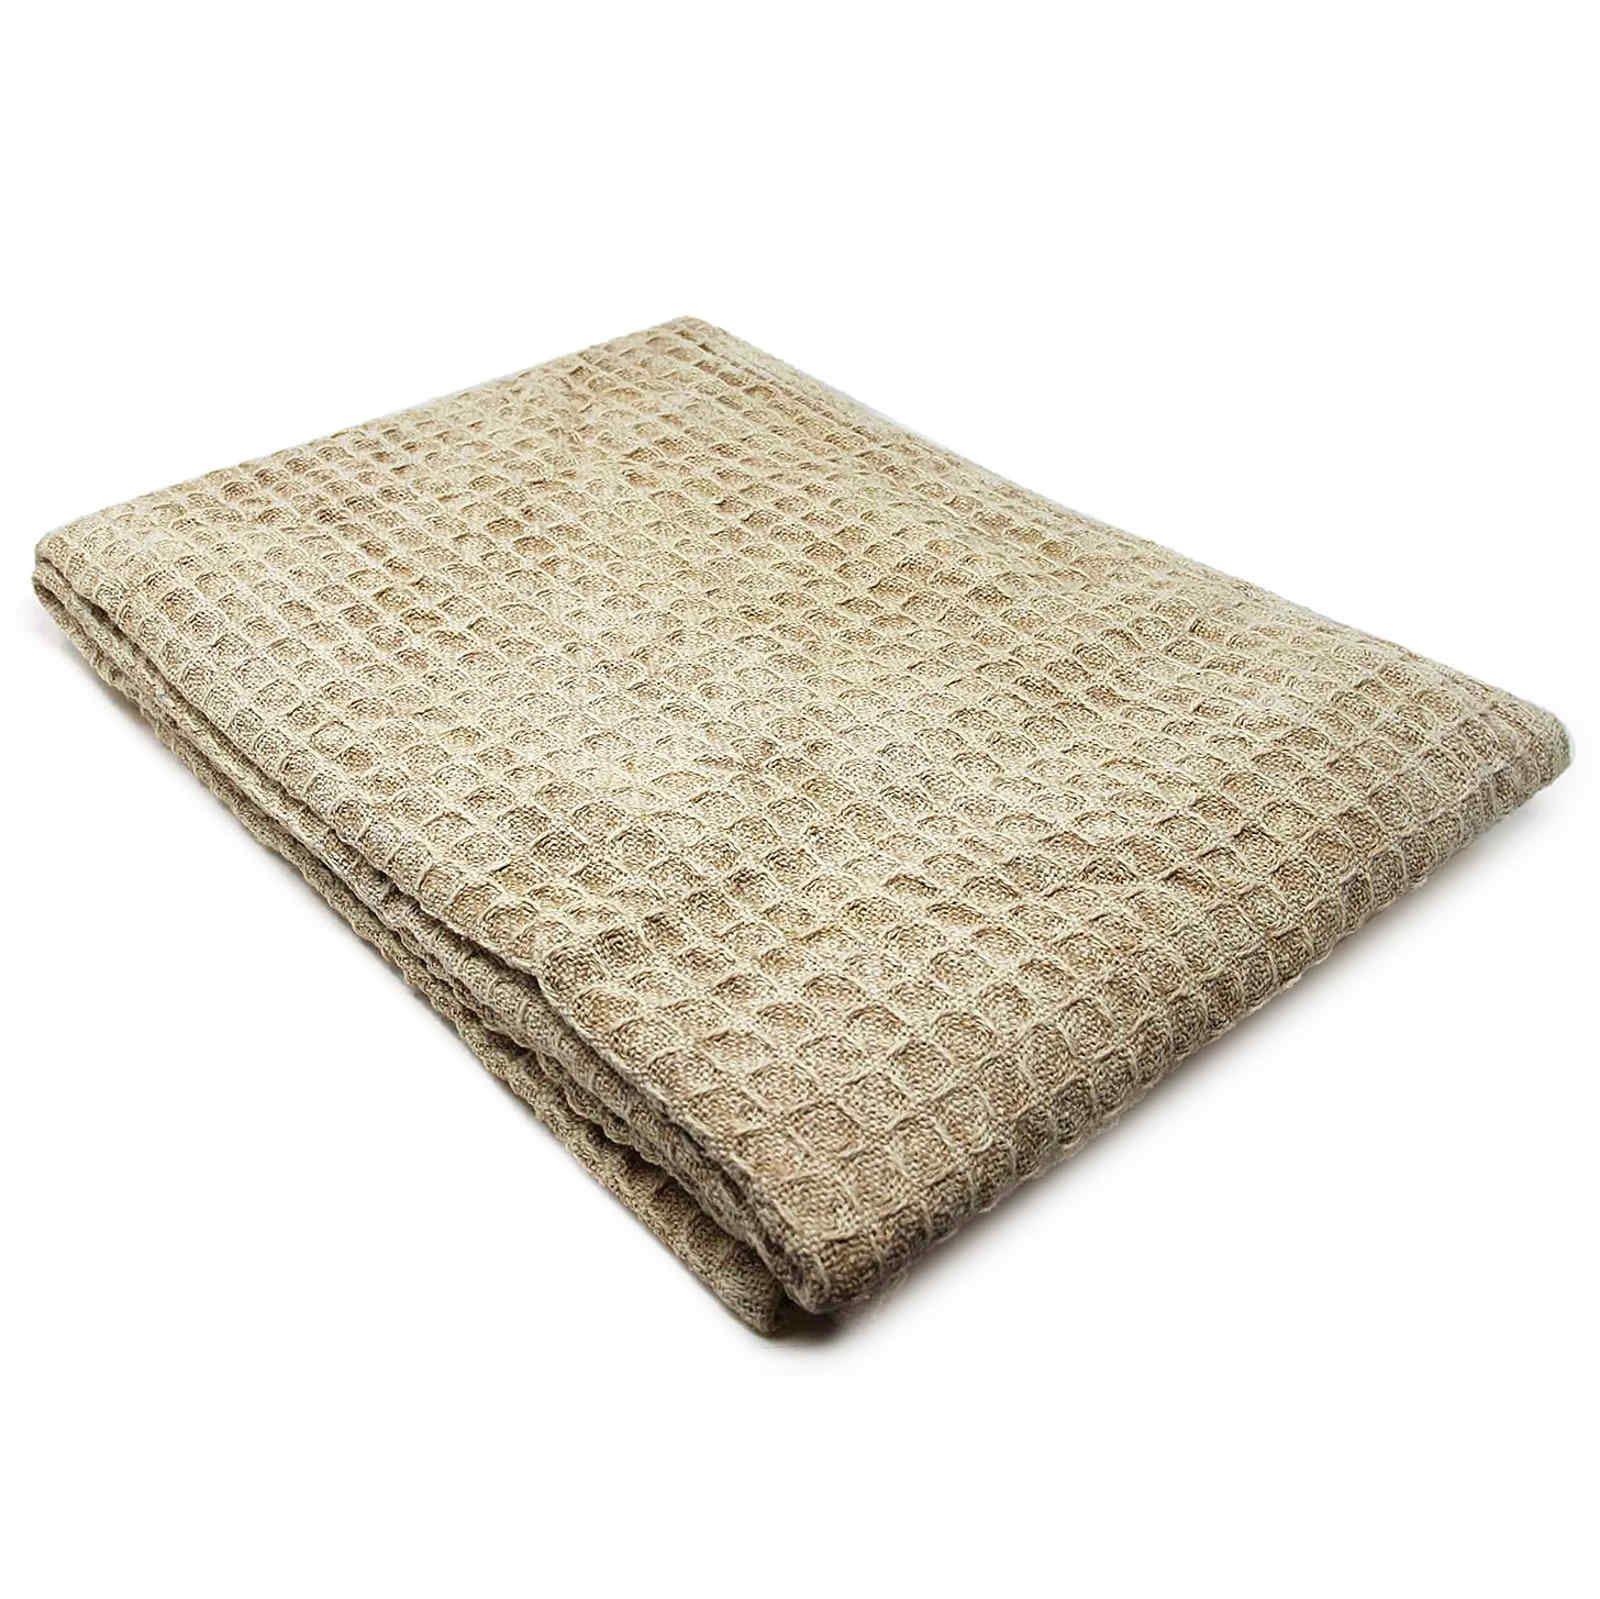 Oregon-Stonewash-Waffle-Throw-Modern-Distressed-Sofa-Bed-Blankets-100-Cotton thumbnail 7